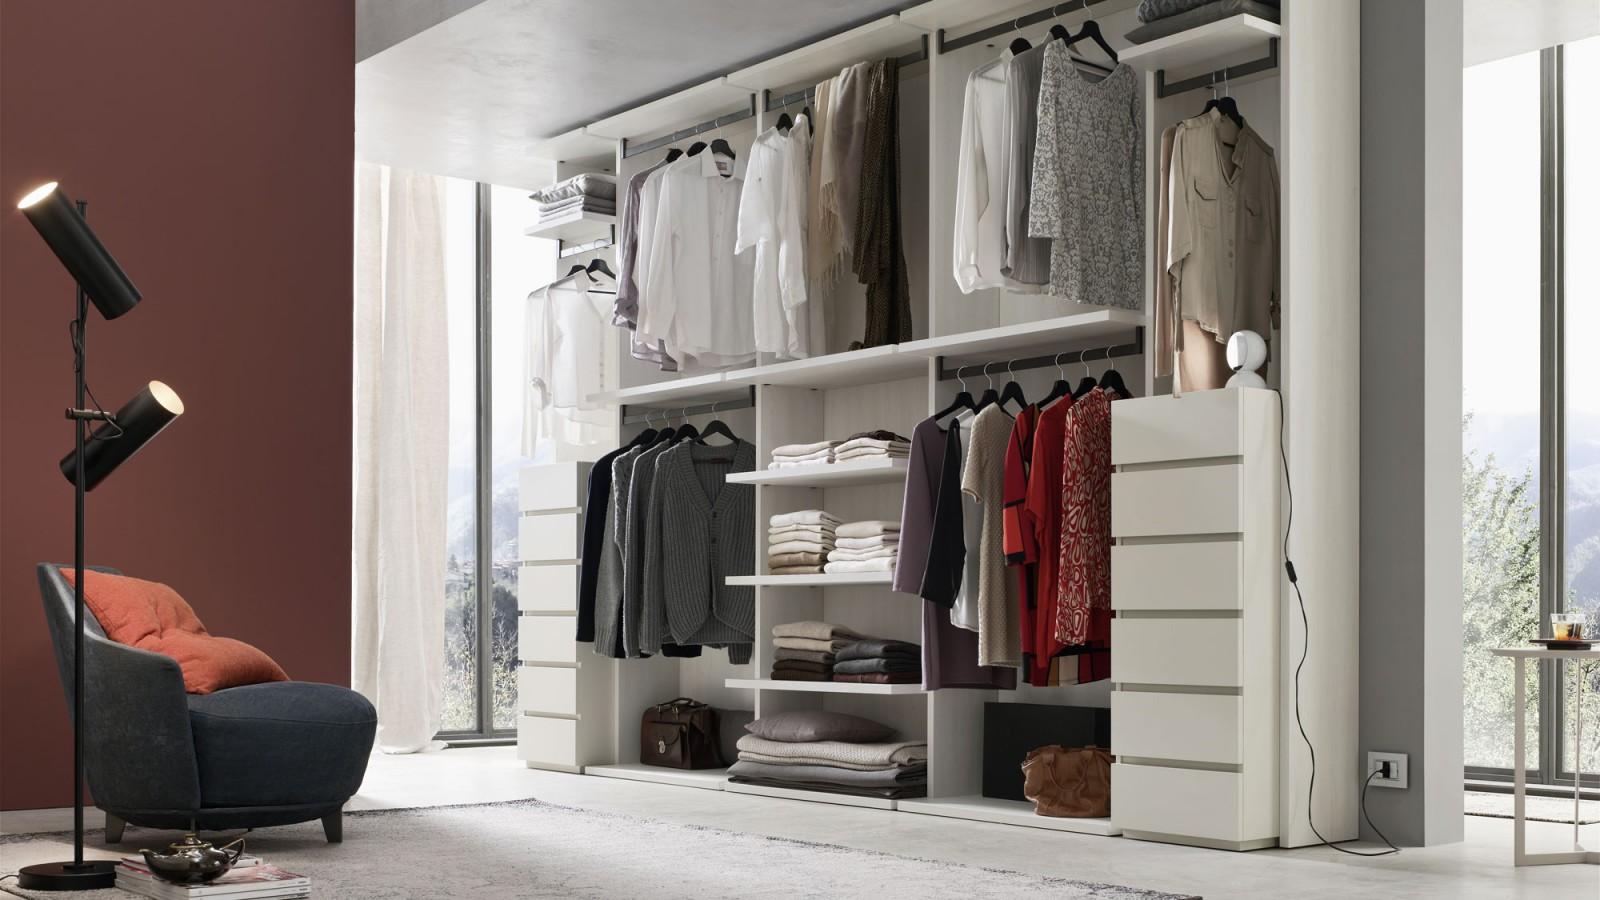 Cabina armadio flexi orme centro mobili godiasco for Cabina armadio